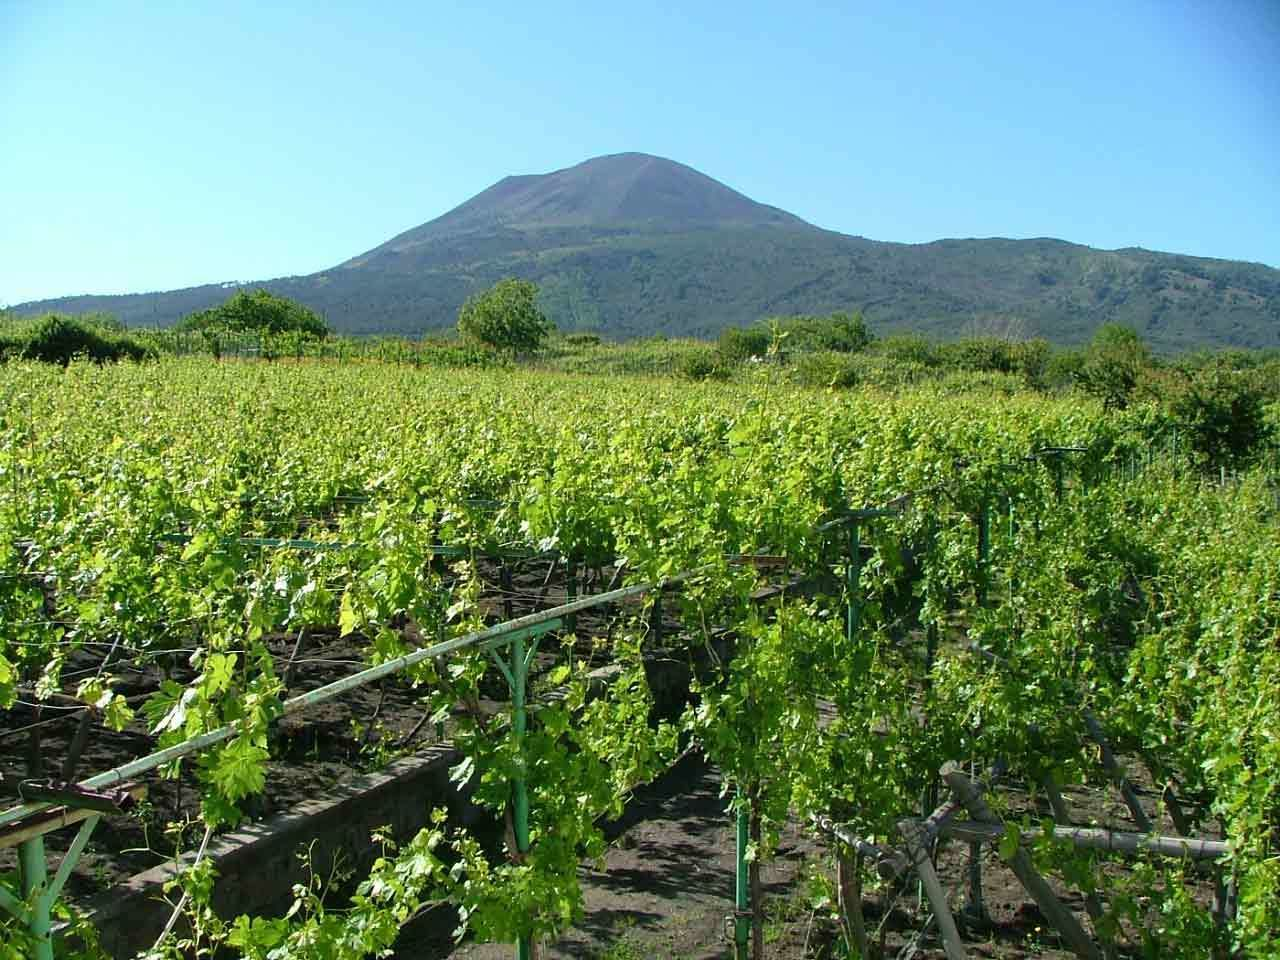 Mount Vesuvius & Vineyard, Lunch & Wine Tasting